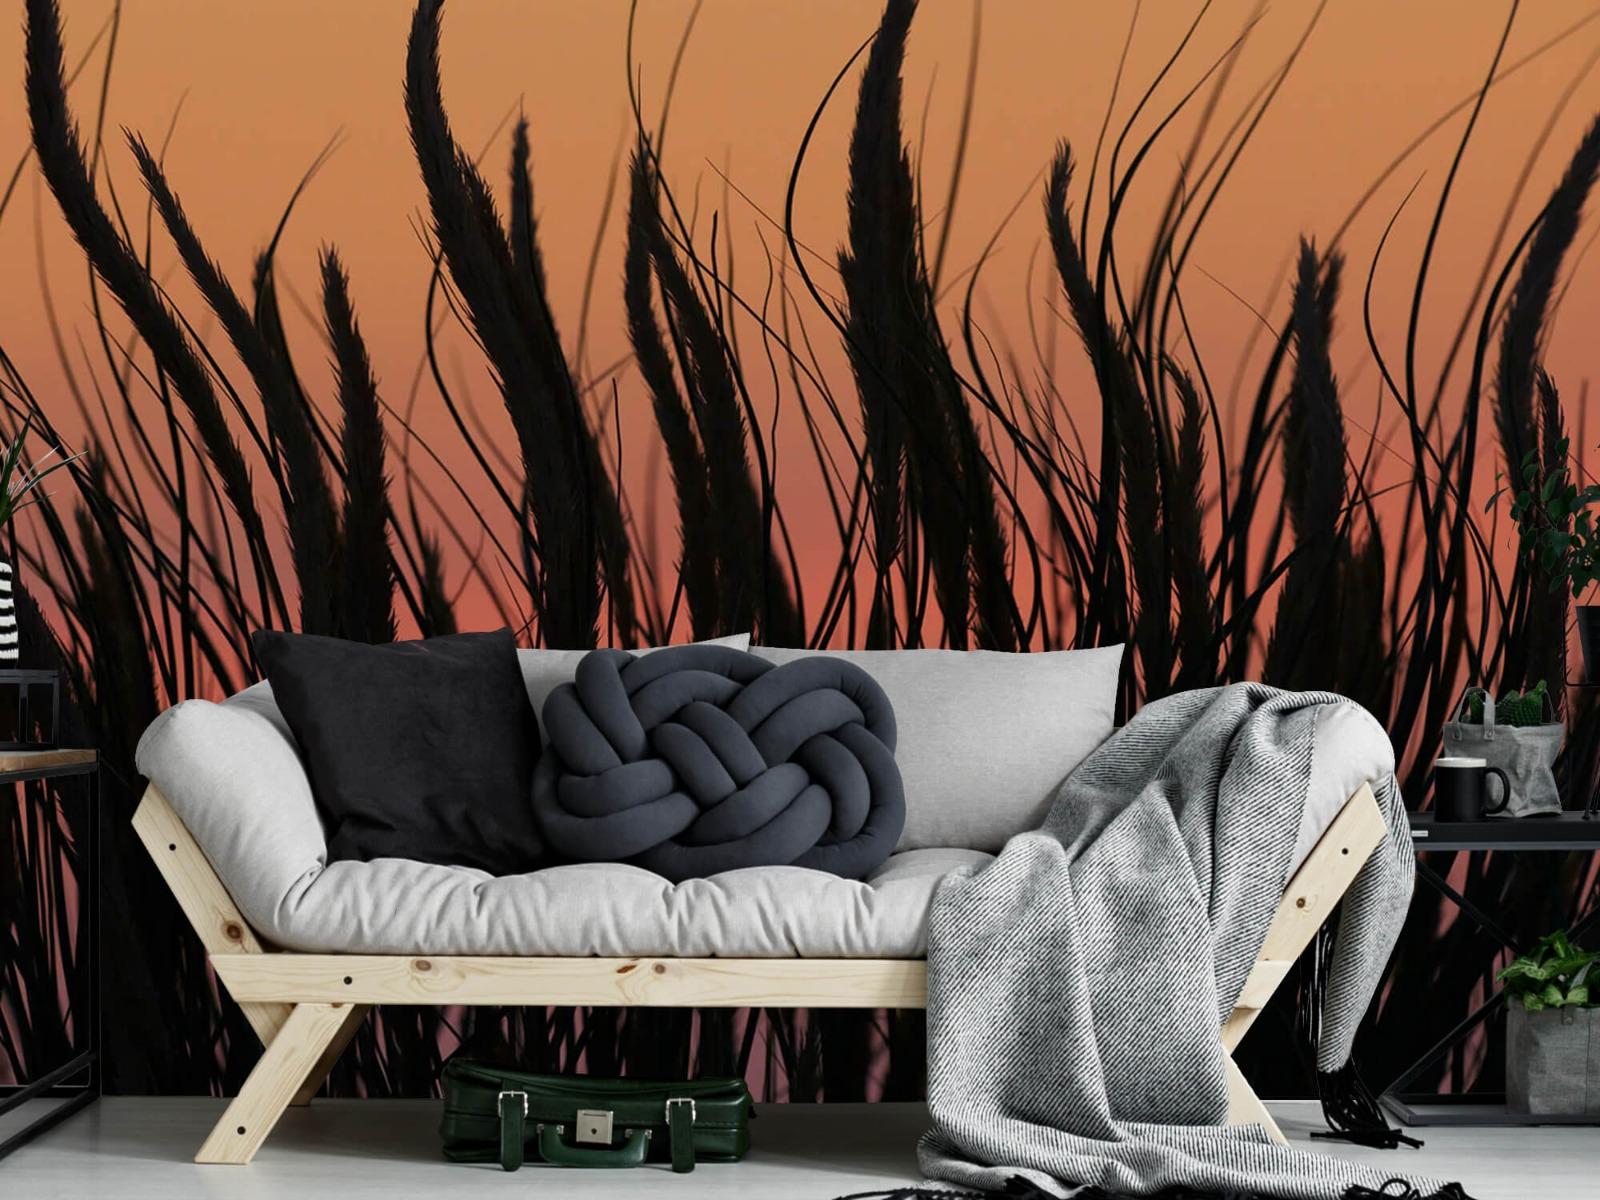 Zomer behang - Helmgras in de avond - Slaapkamer 6